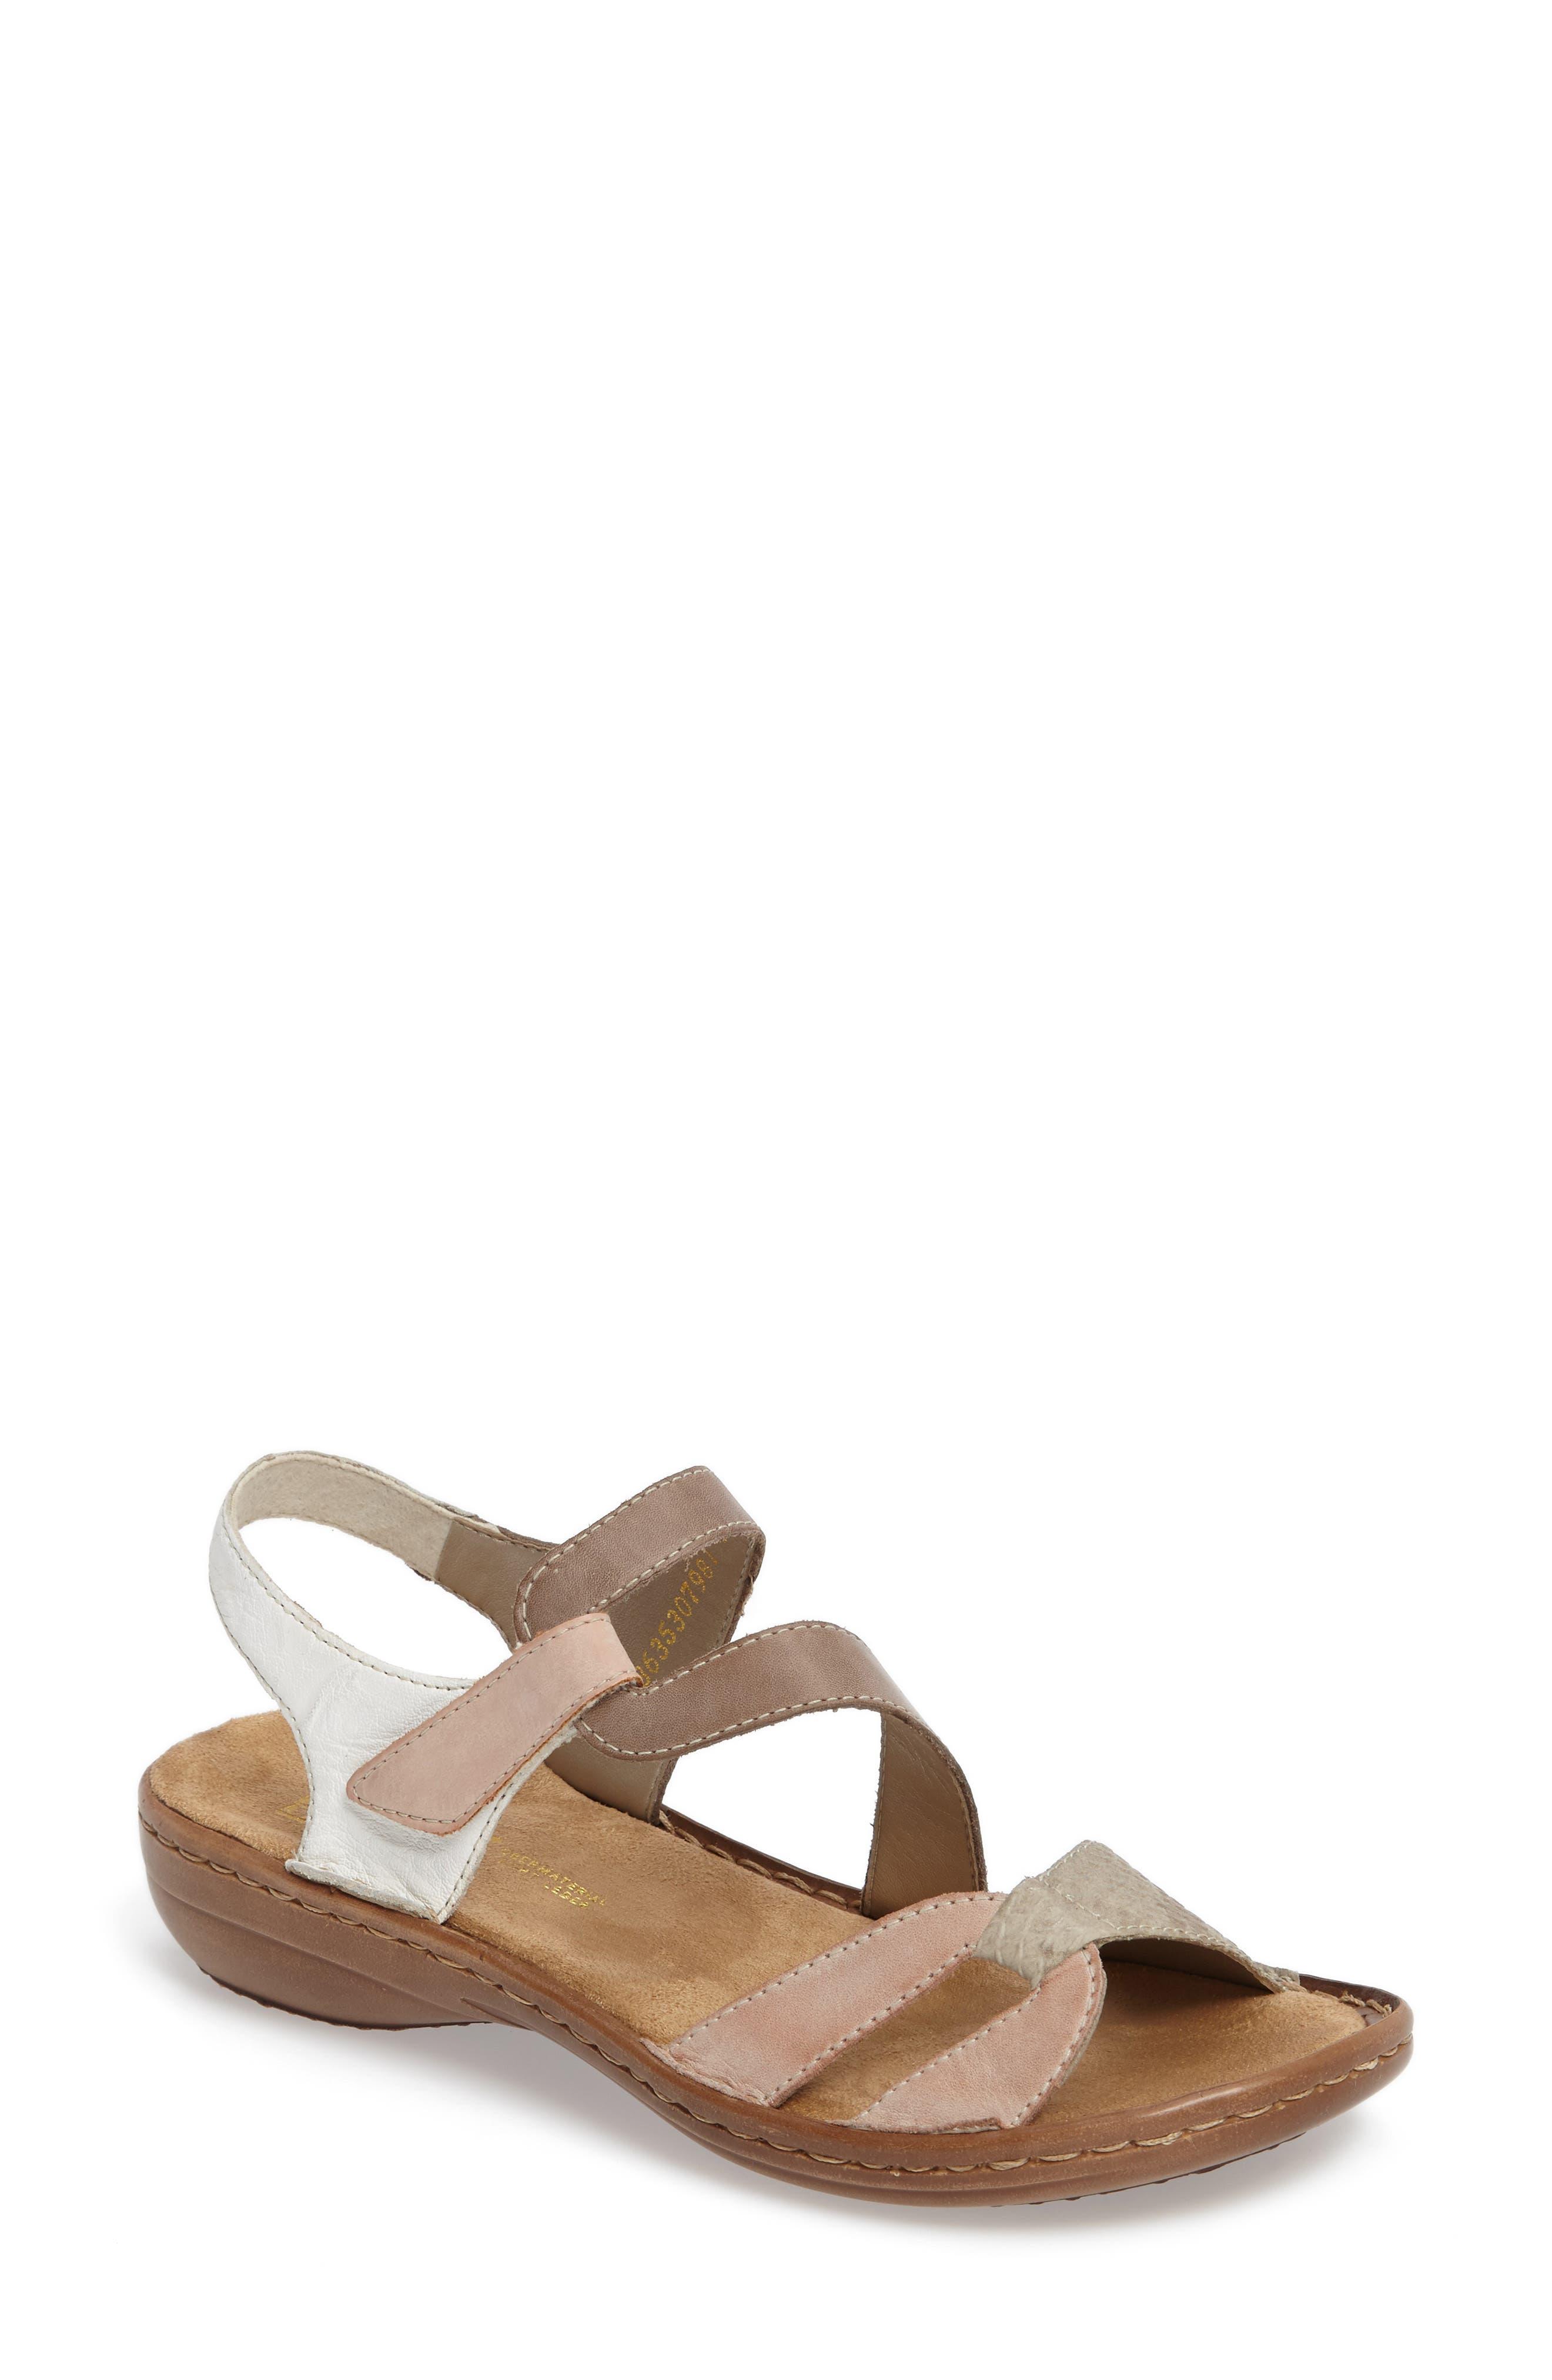 Regina 66 Wedge Sandal,                         Main,                         color, ROSE LEATHER